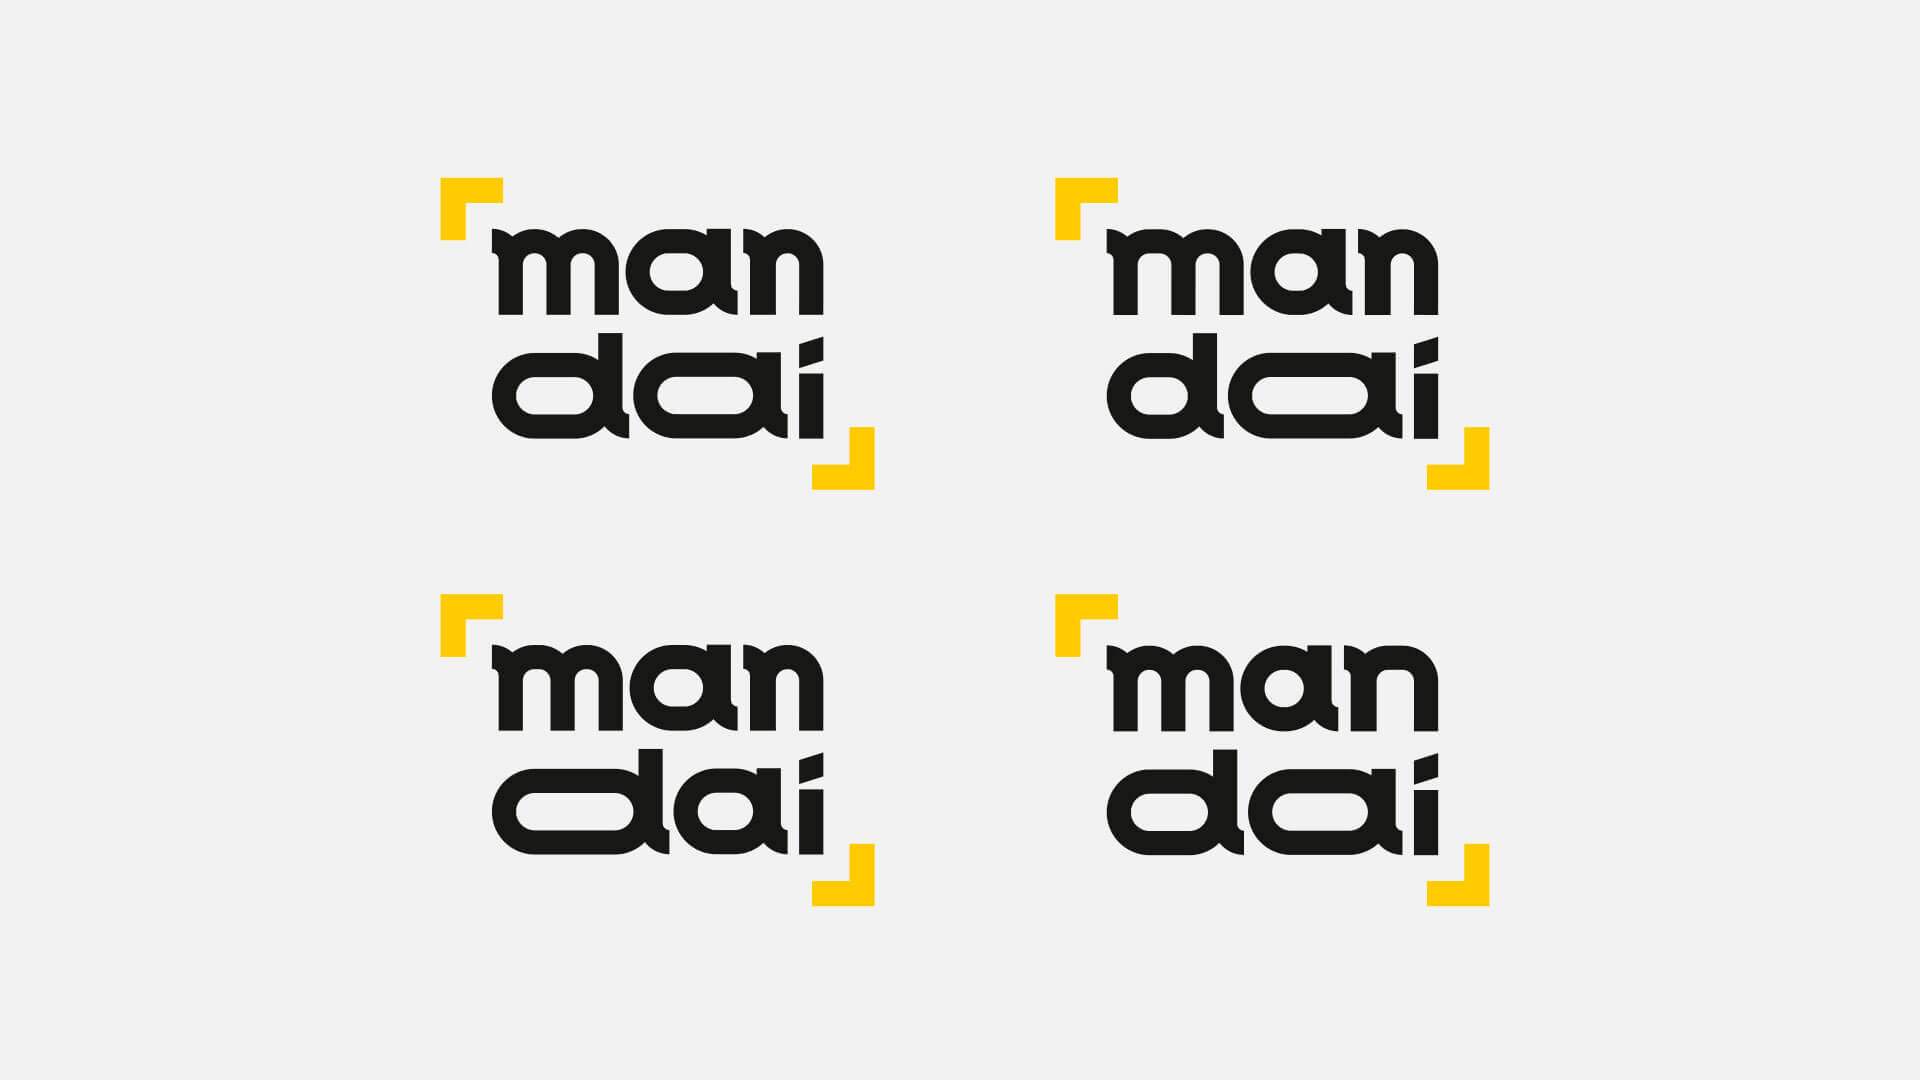 mandai-04